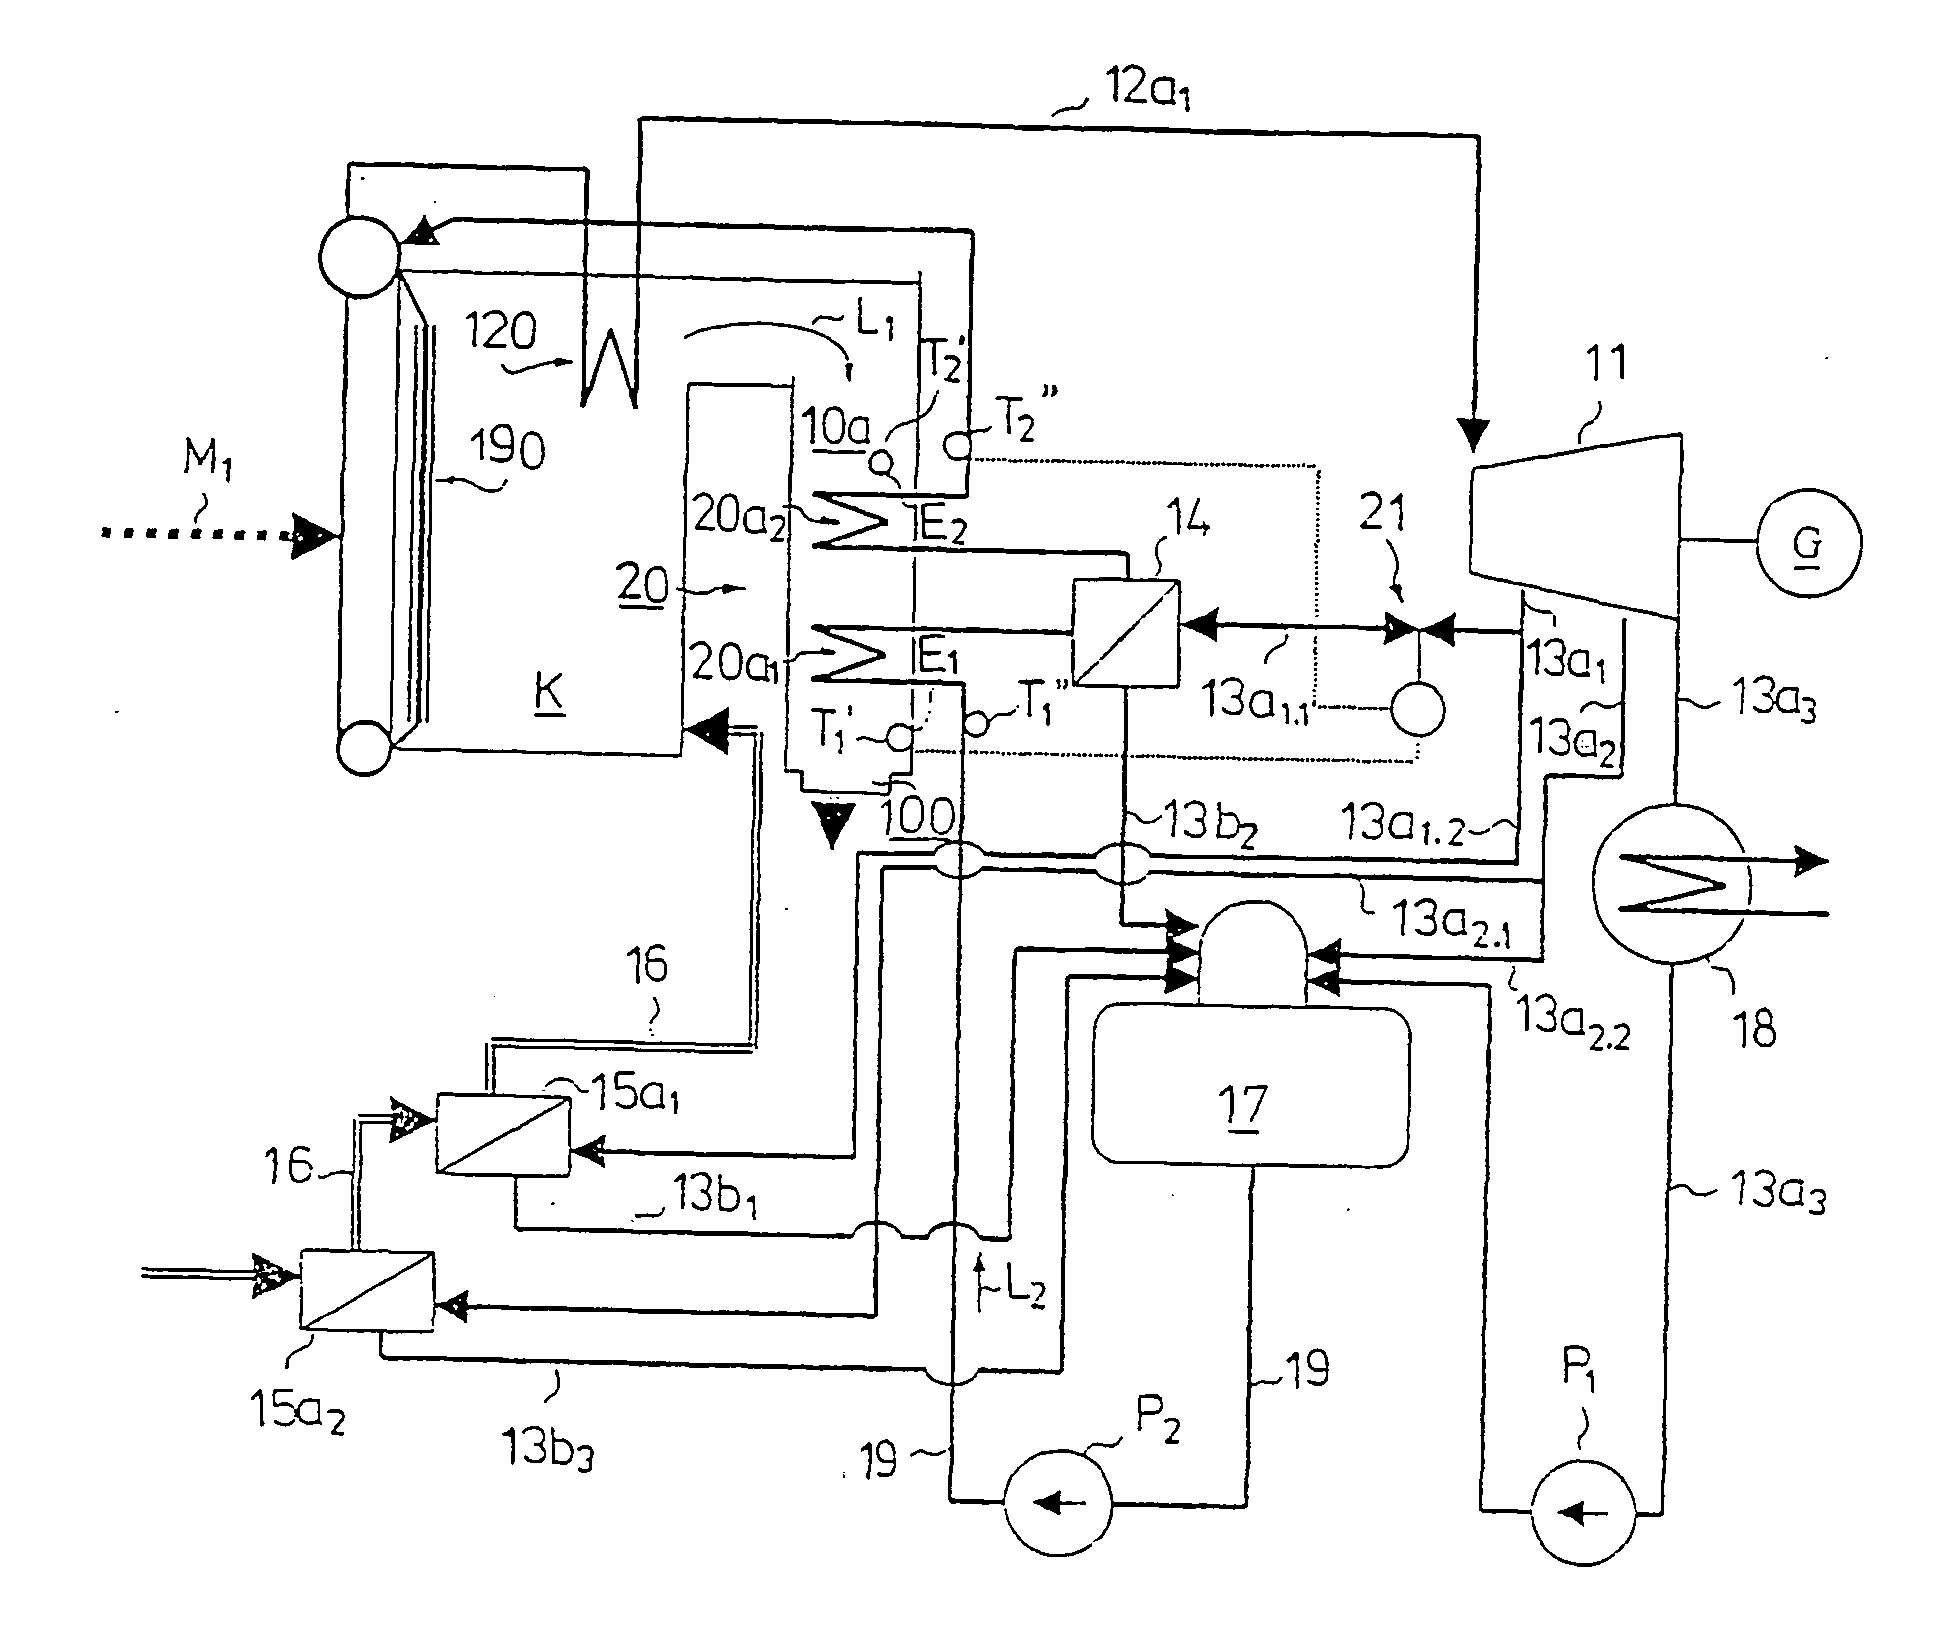 Patent US Integration construction between a boiler